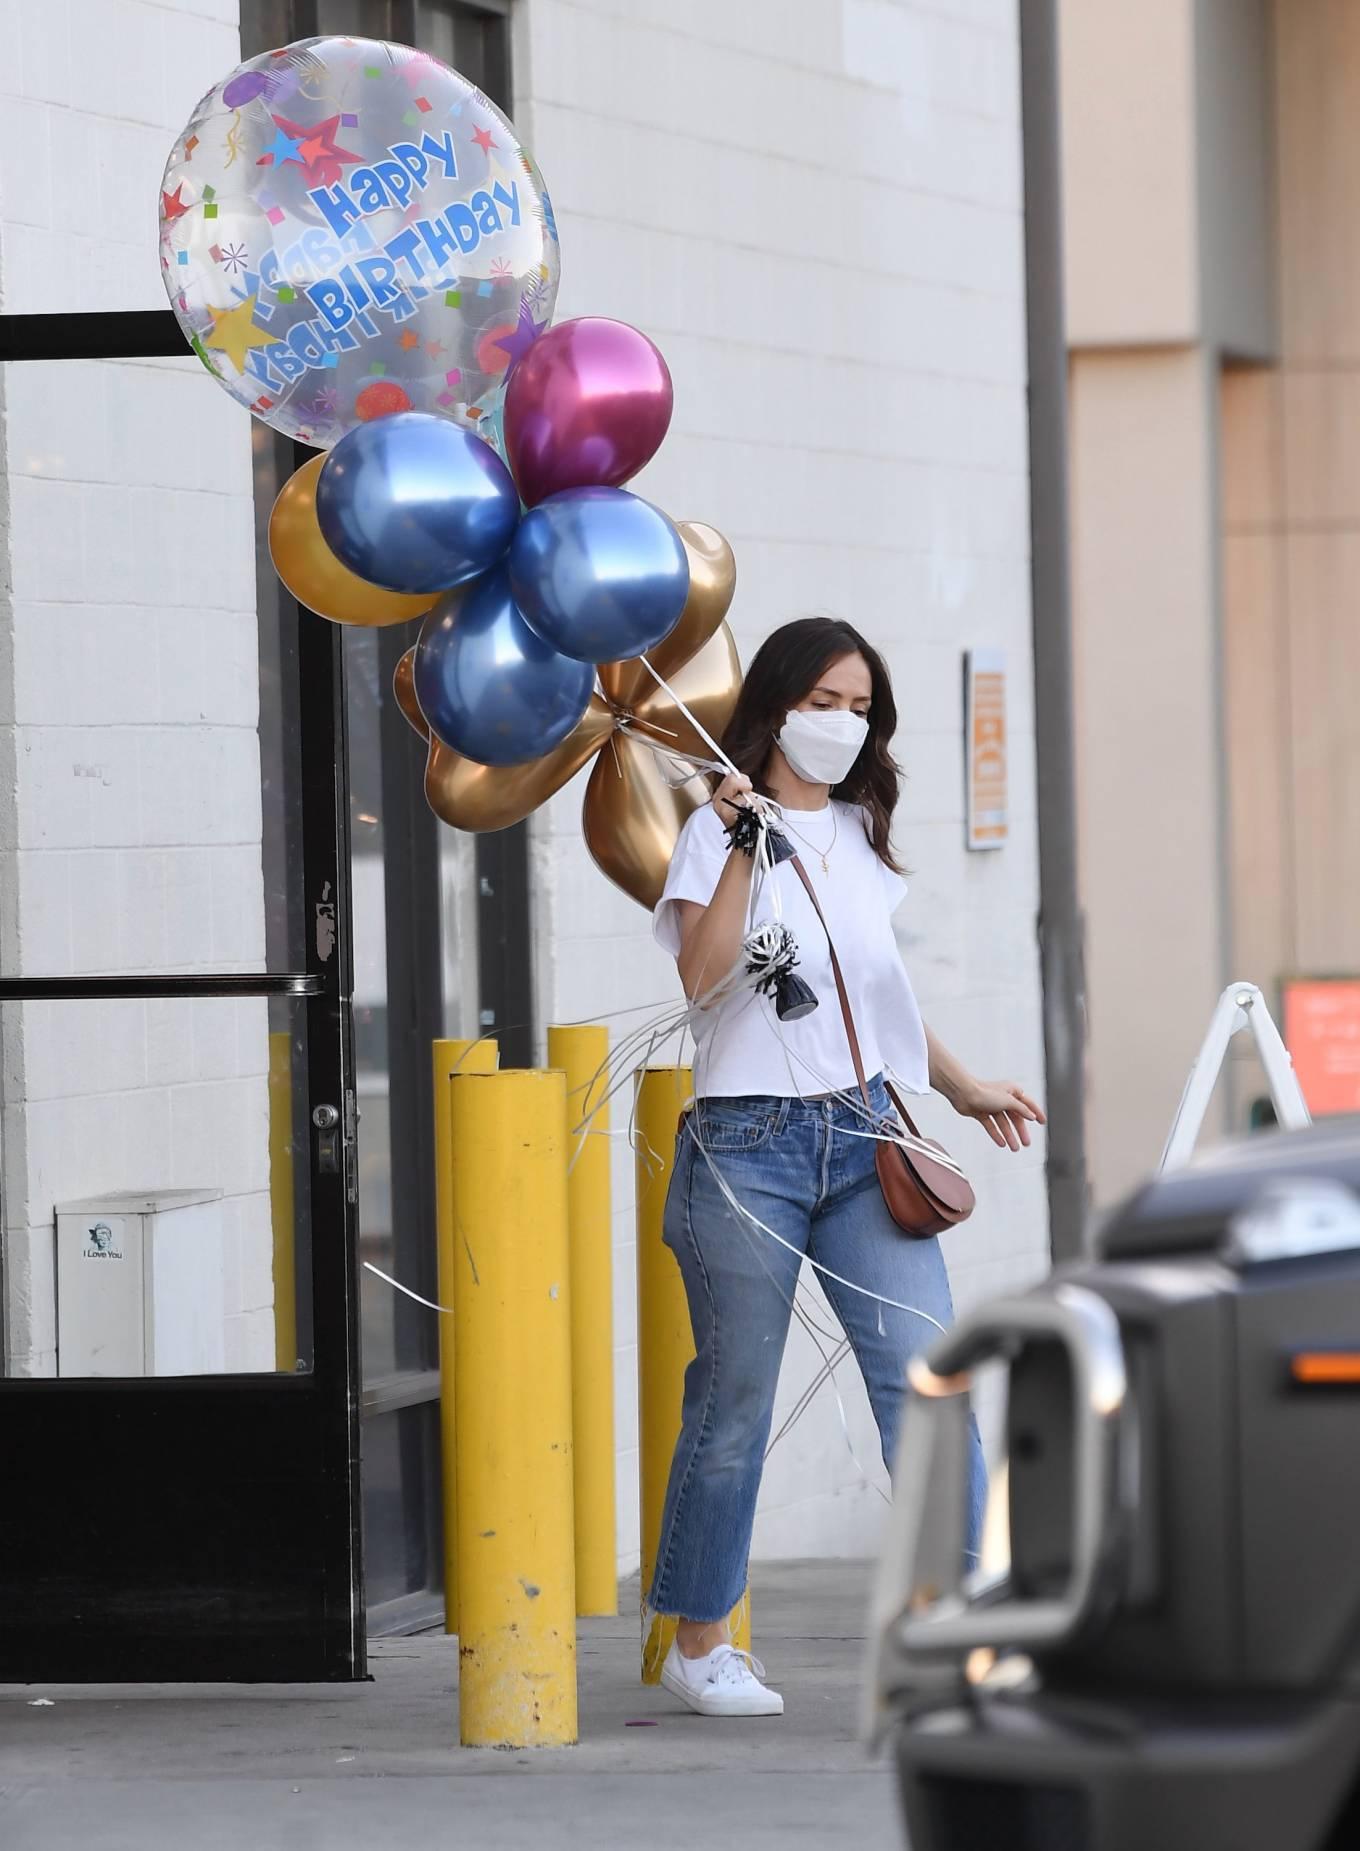 Minka Kelly - Buys balloons in New York